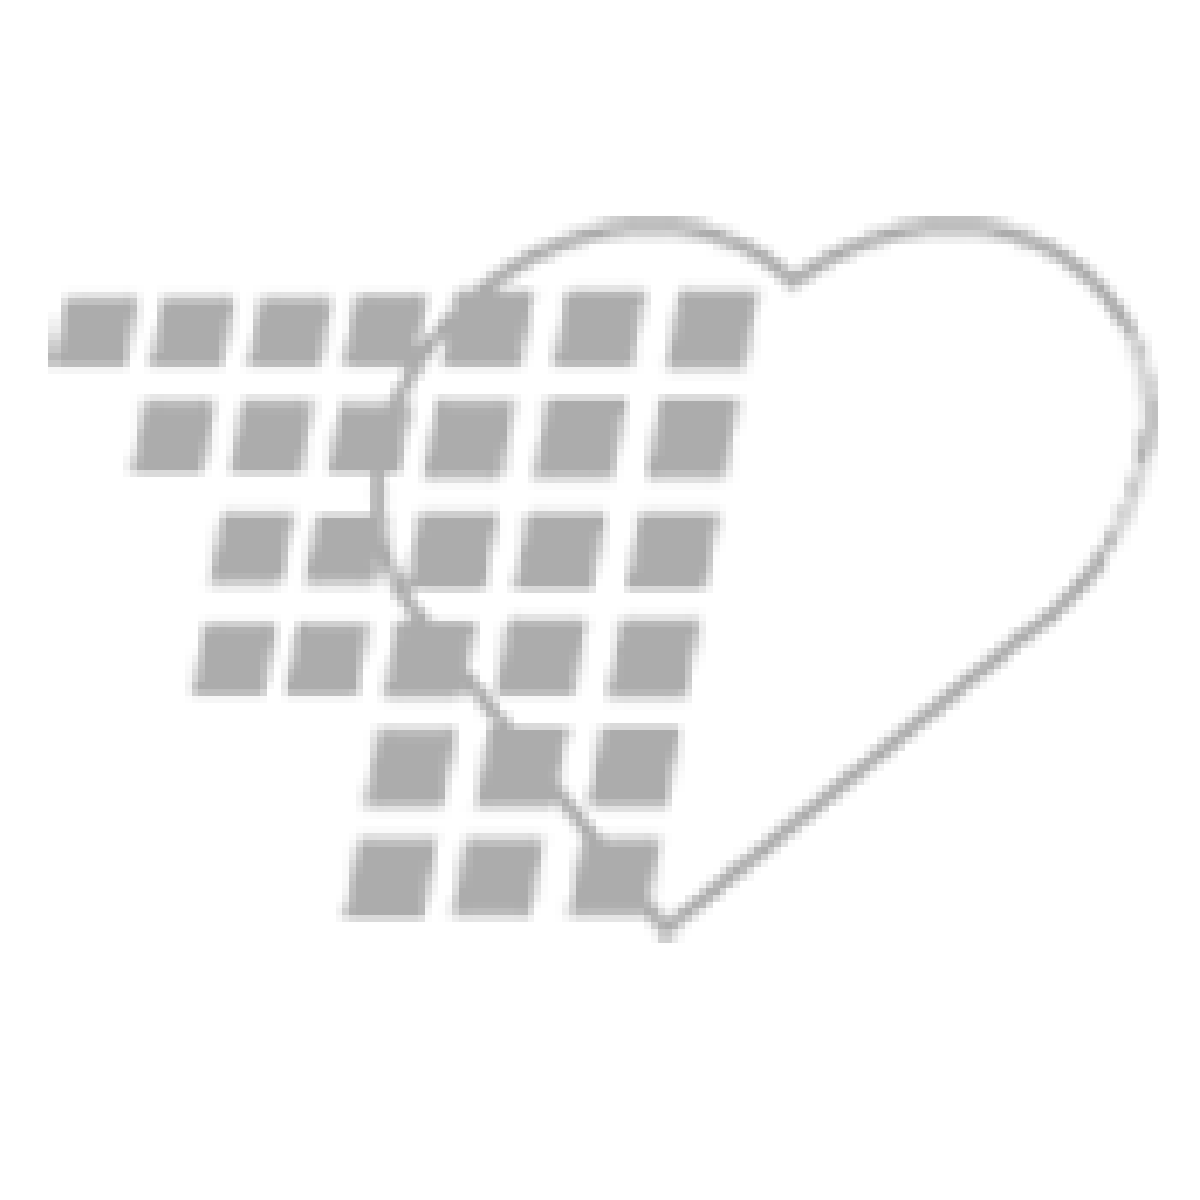 11-81-0911-WH - Cardionics SAM 3G - Student Auscultation Manikin 3rd Generation - Light